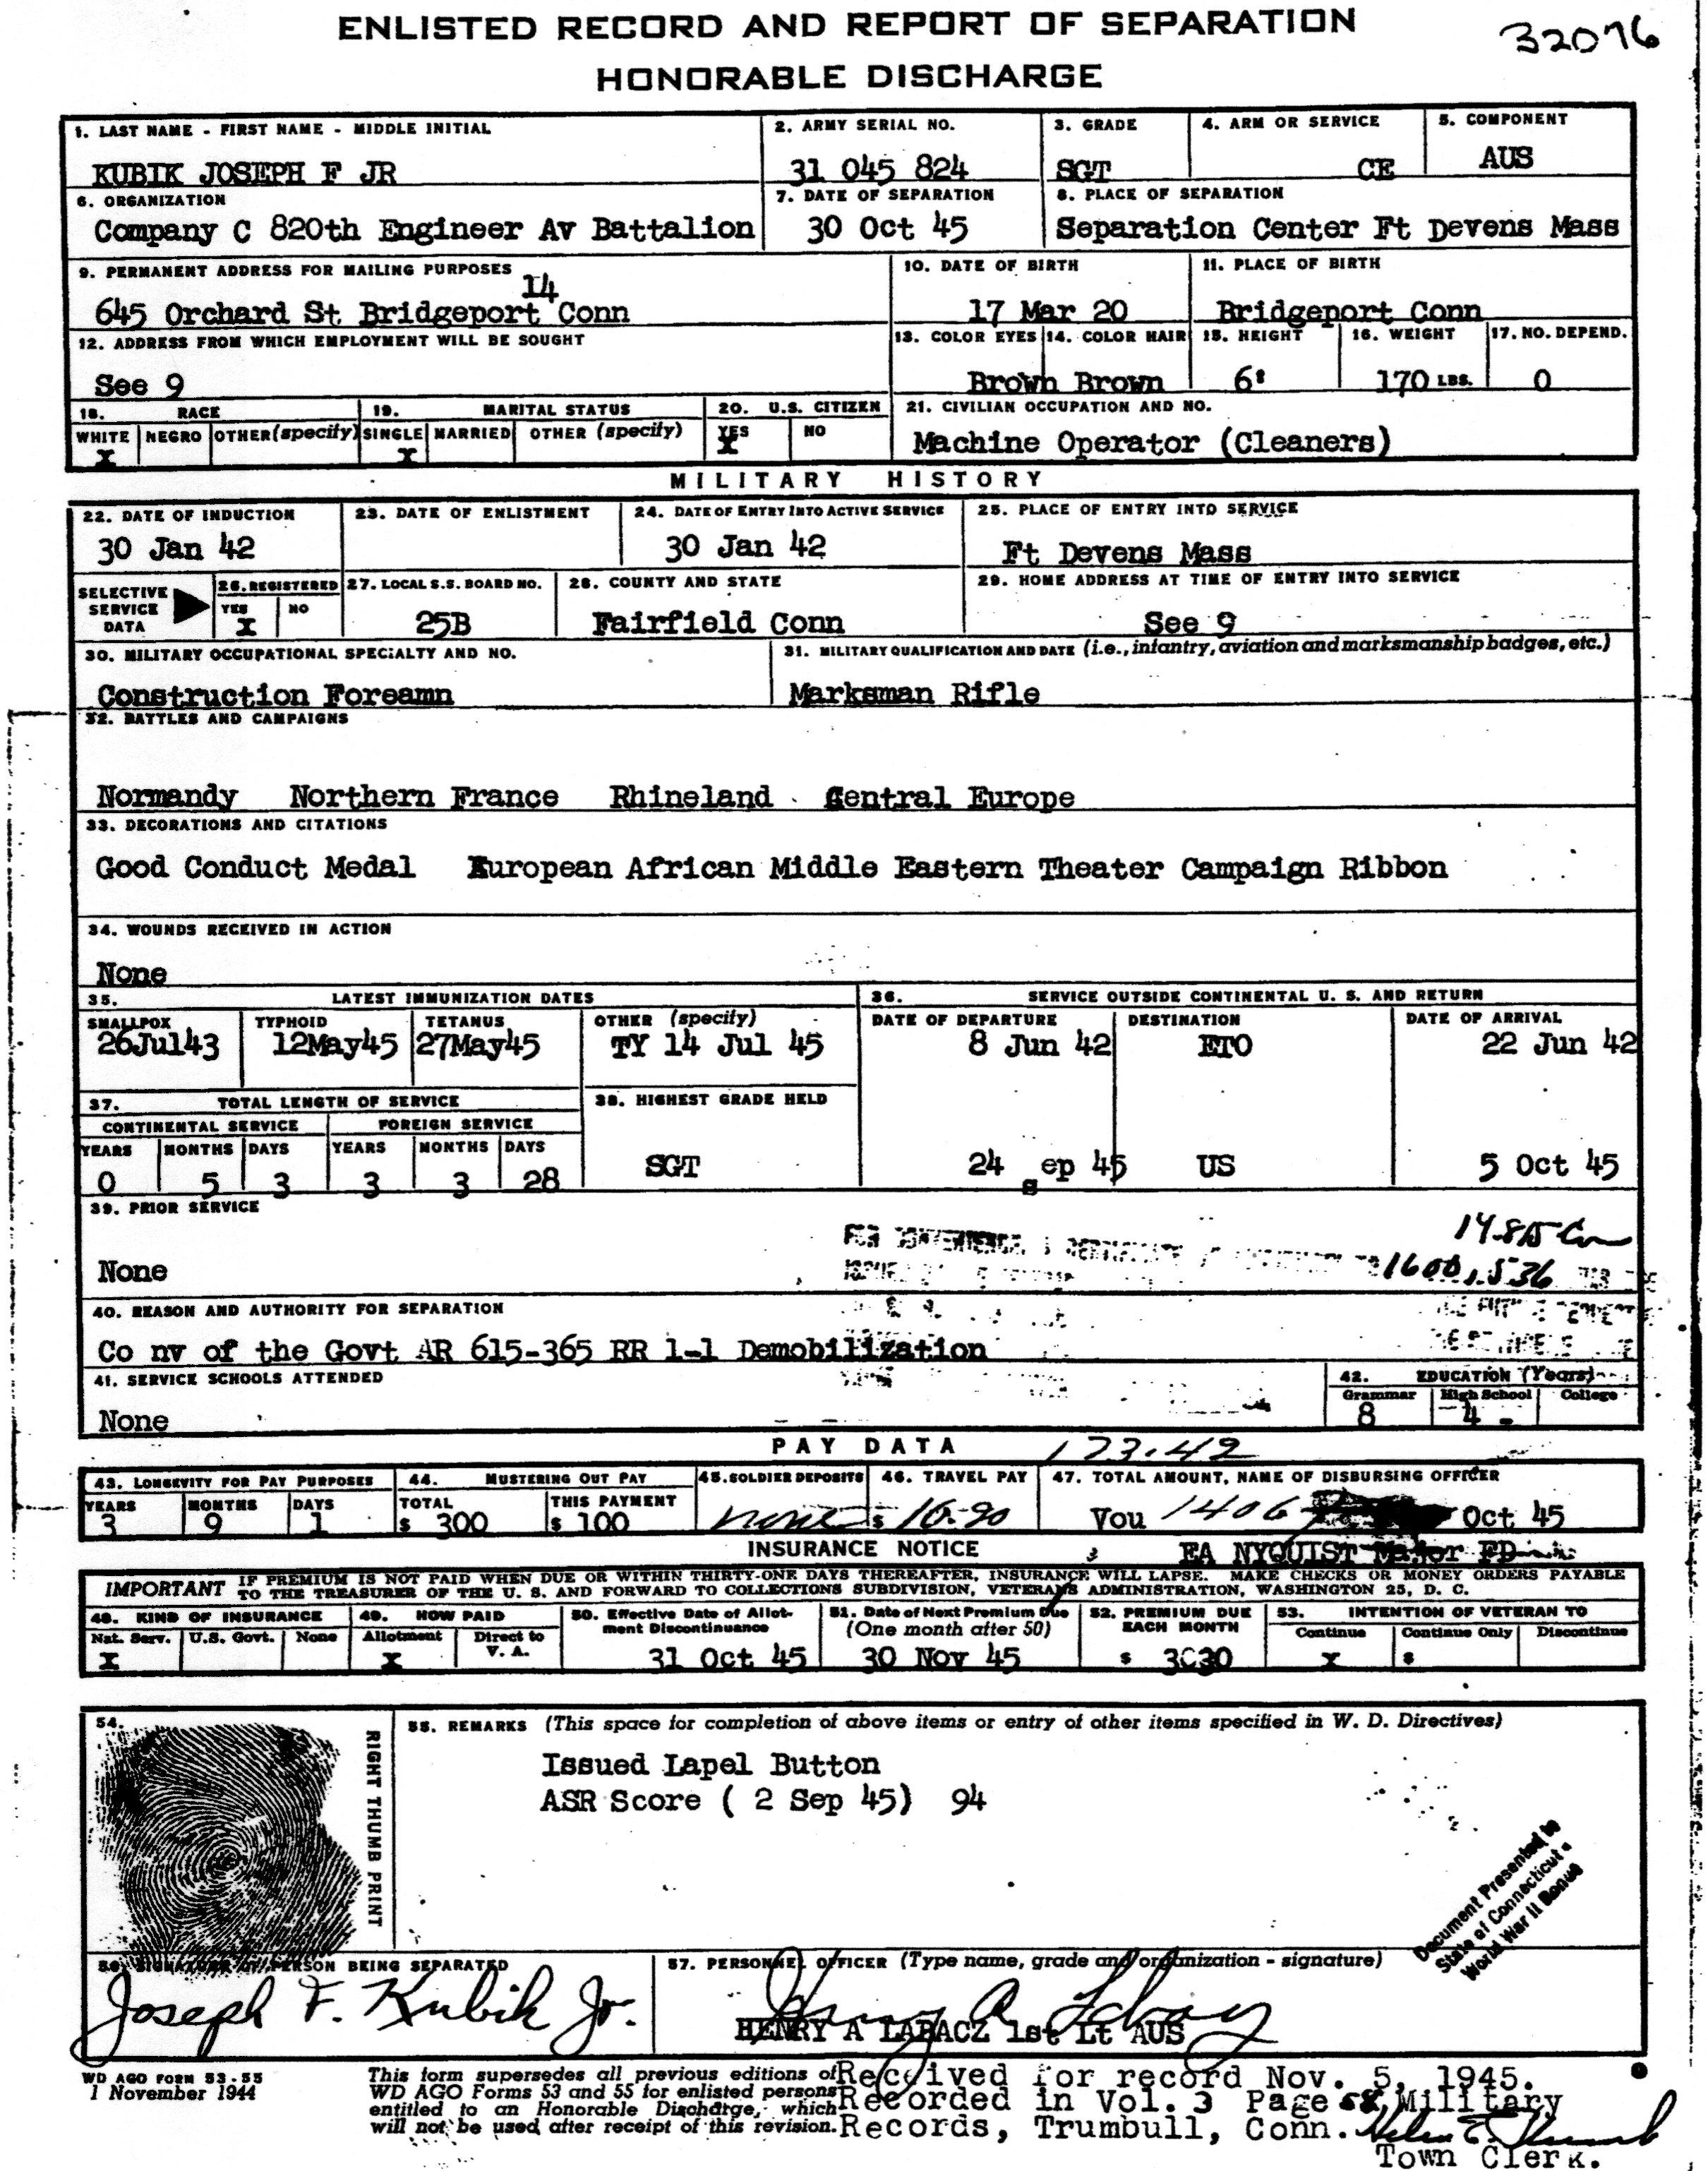 Hon_Discharge_JFK_Jr_page2.jpg